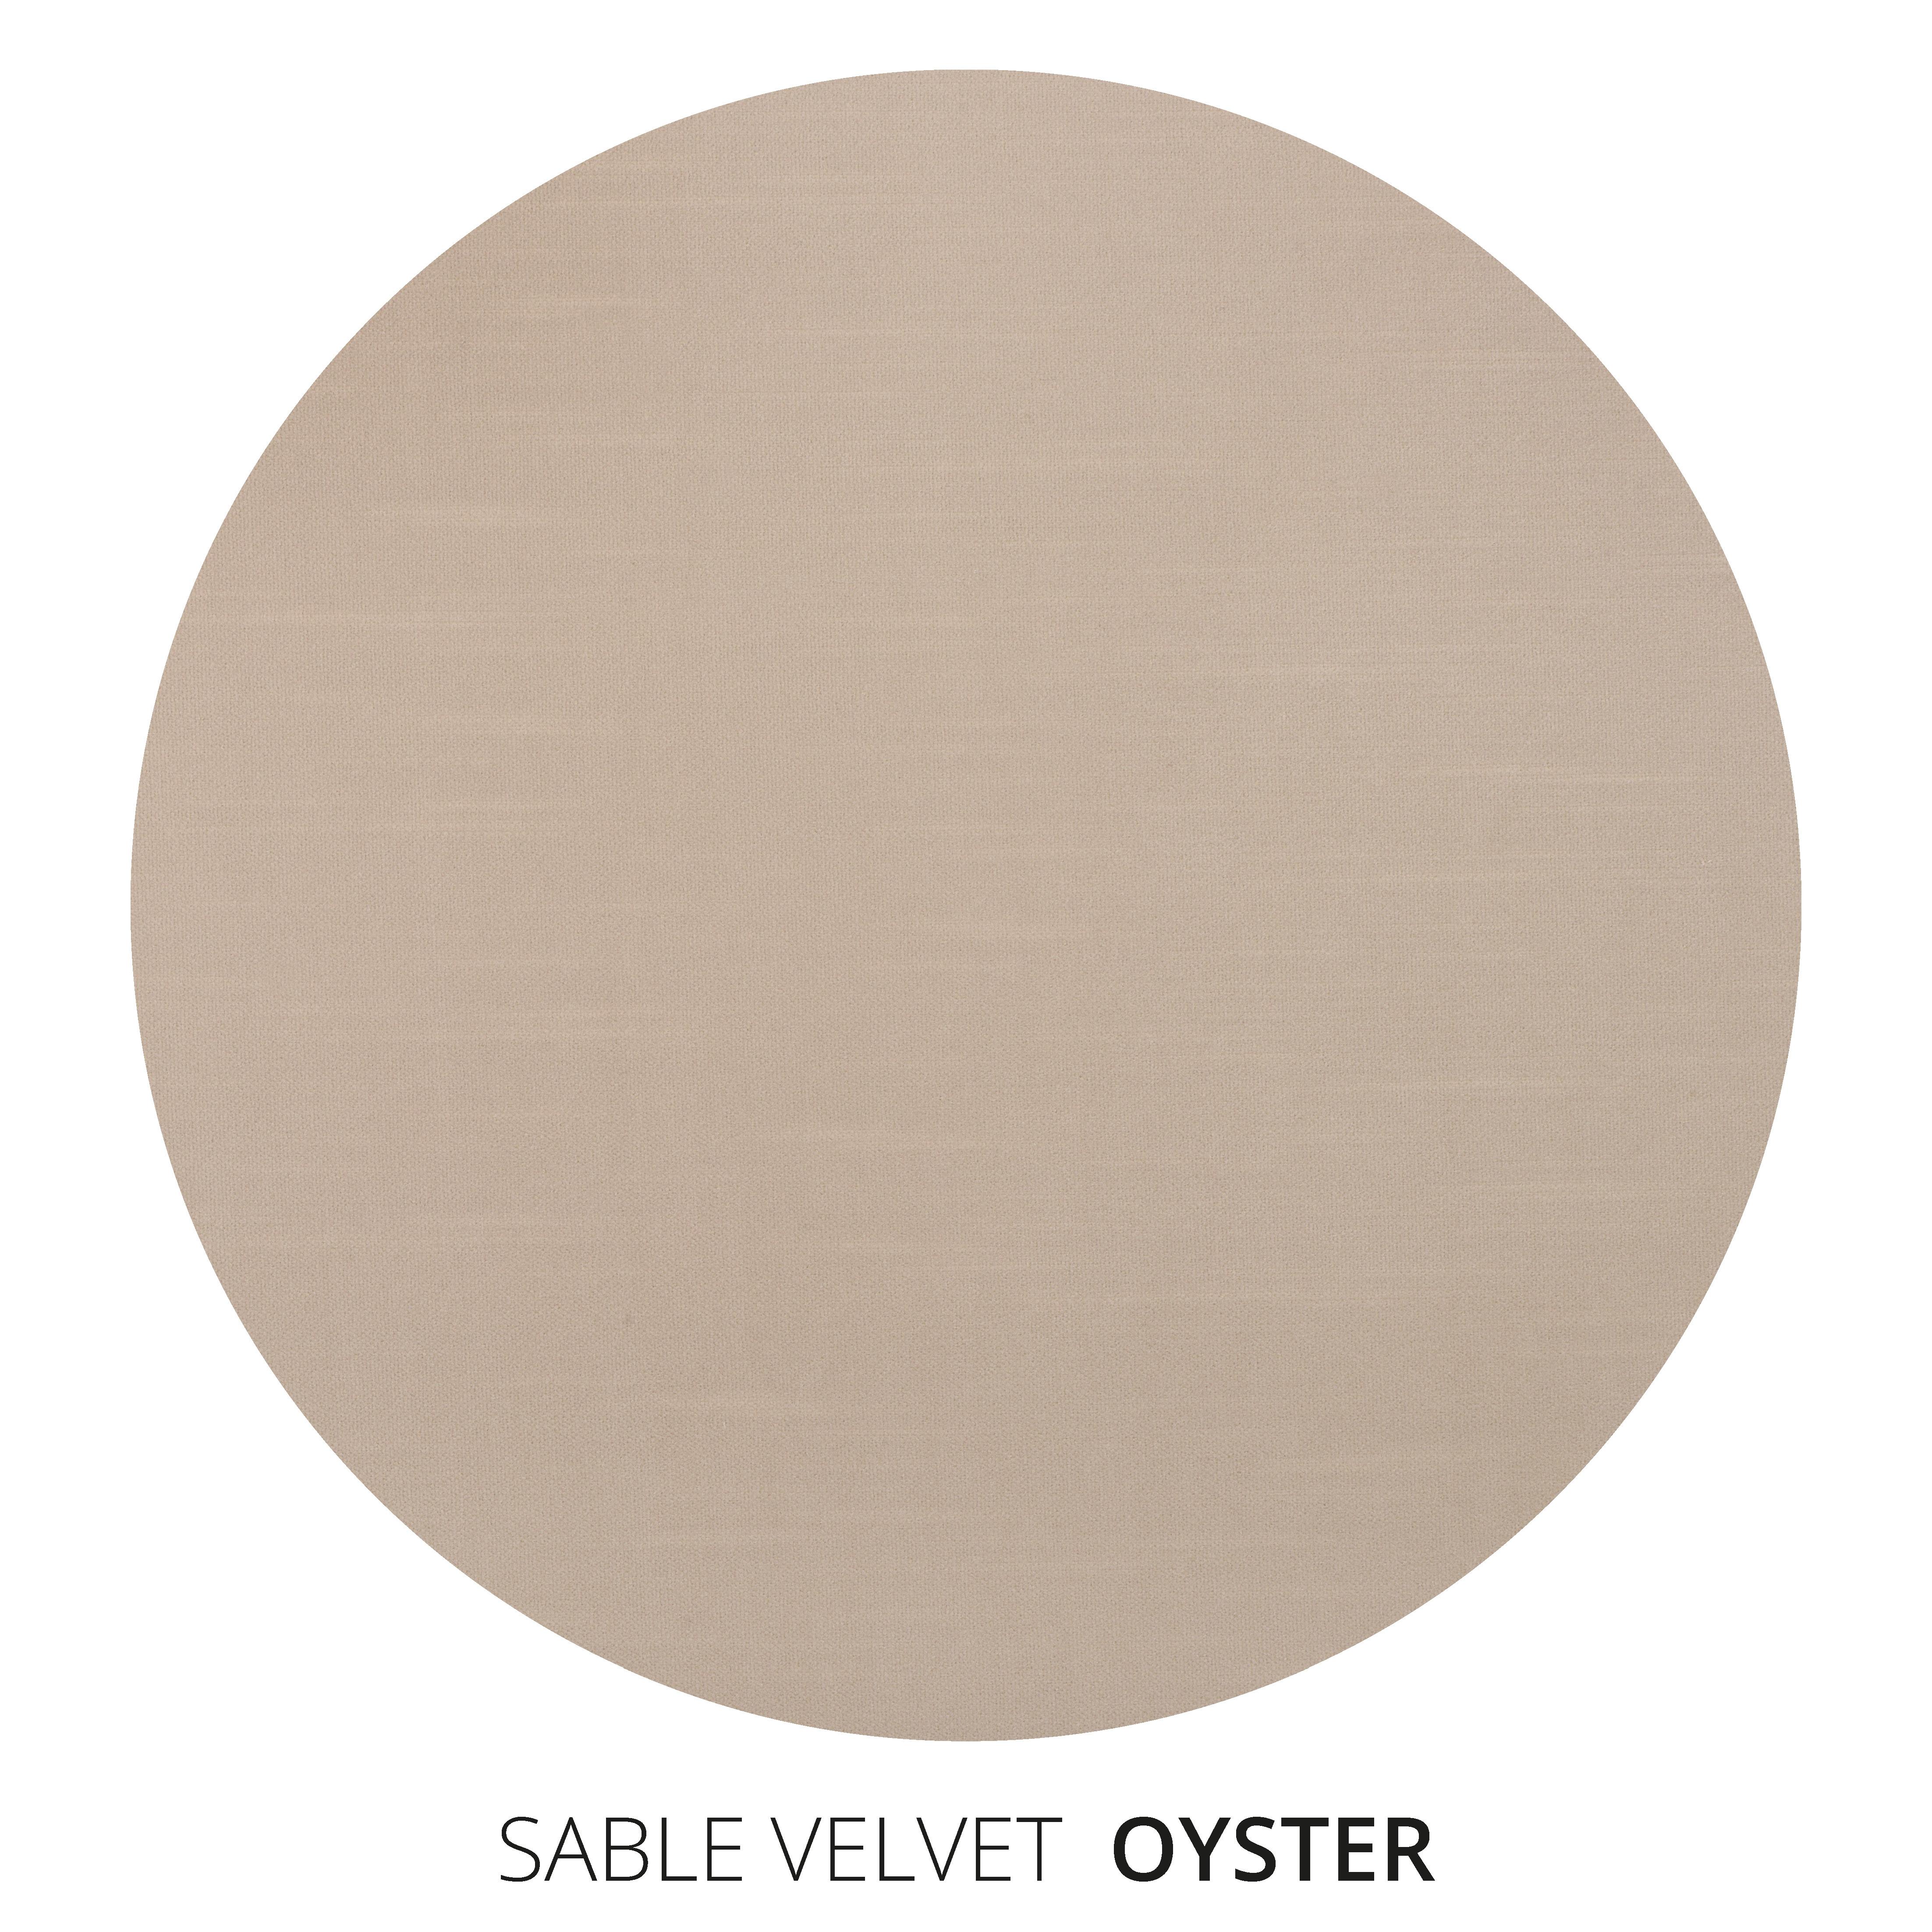 Oyster Sable Velvet Swatch